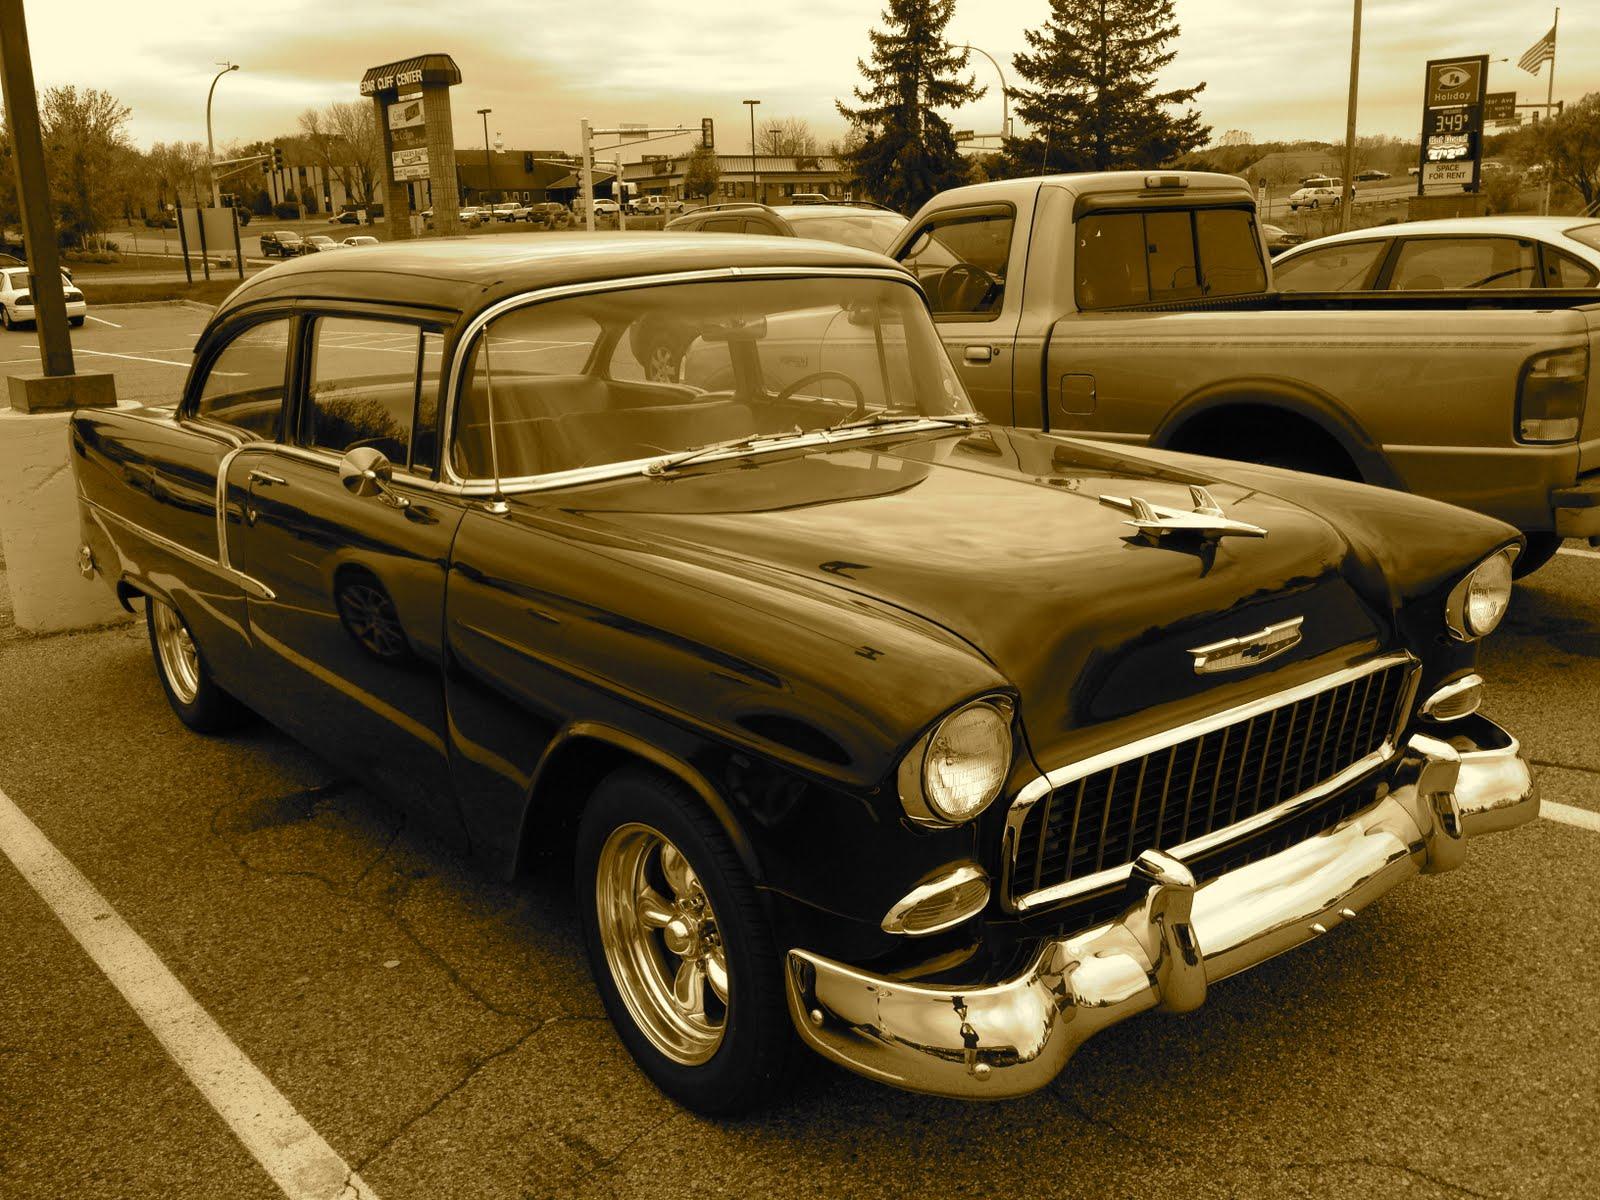 Eagan Daily Photo: Cool classic car